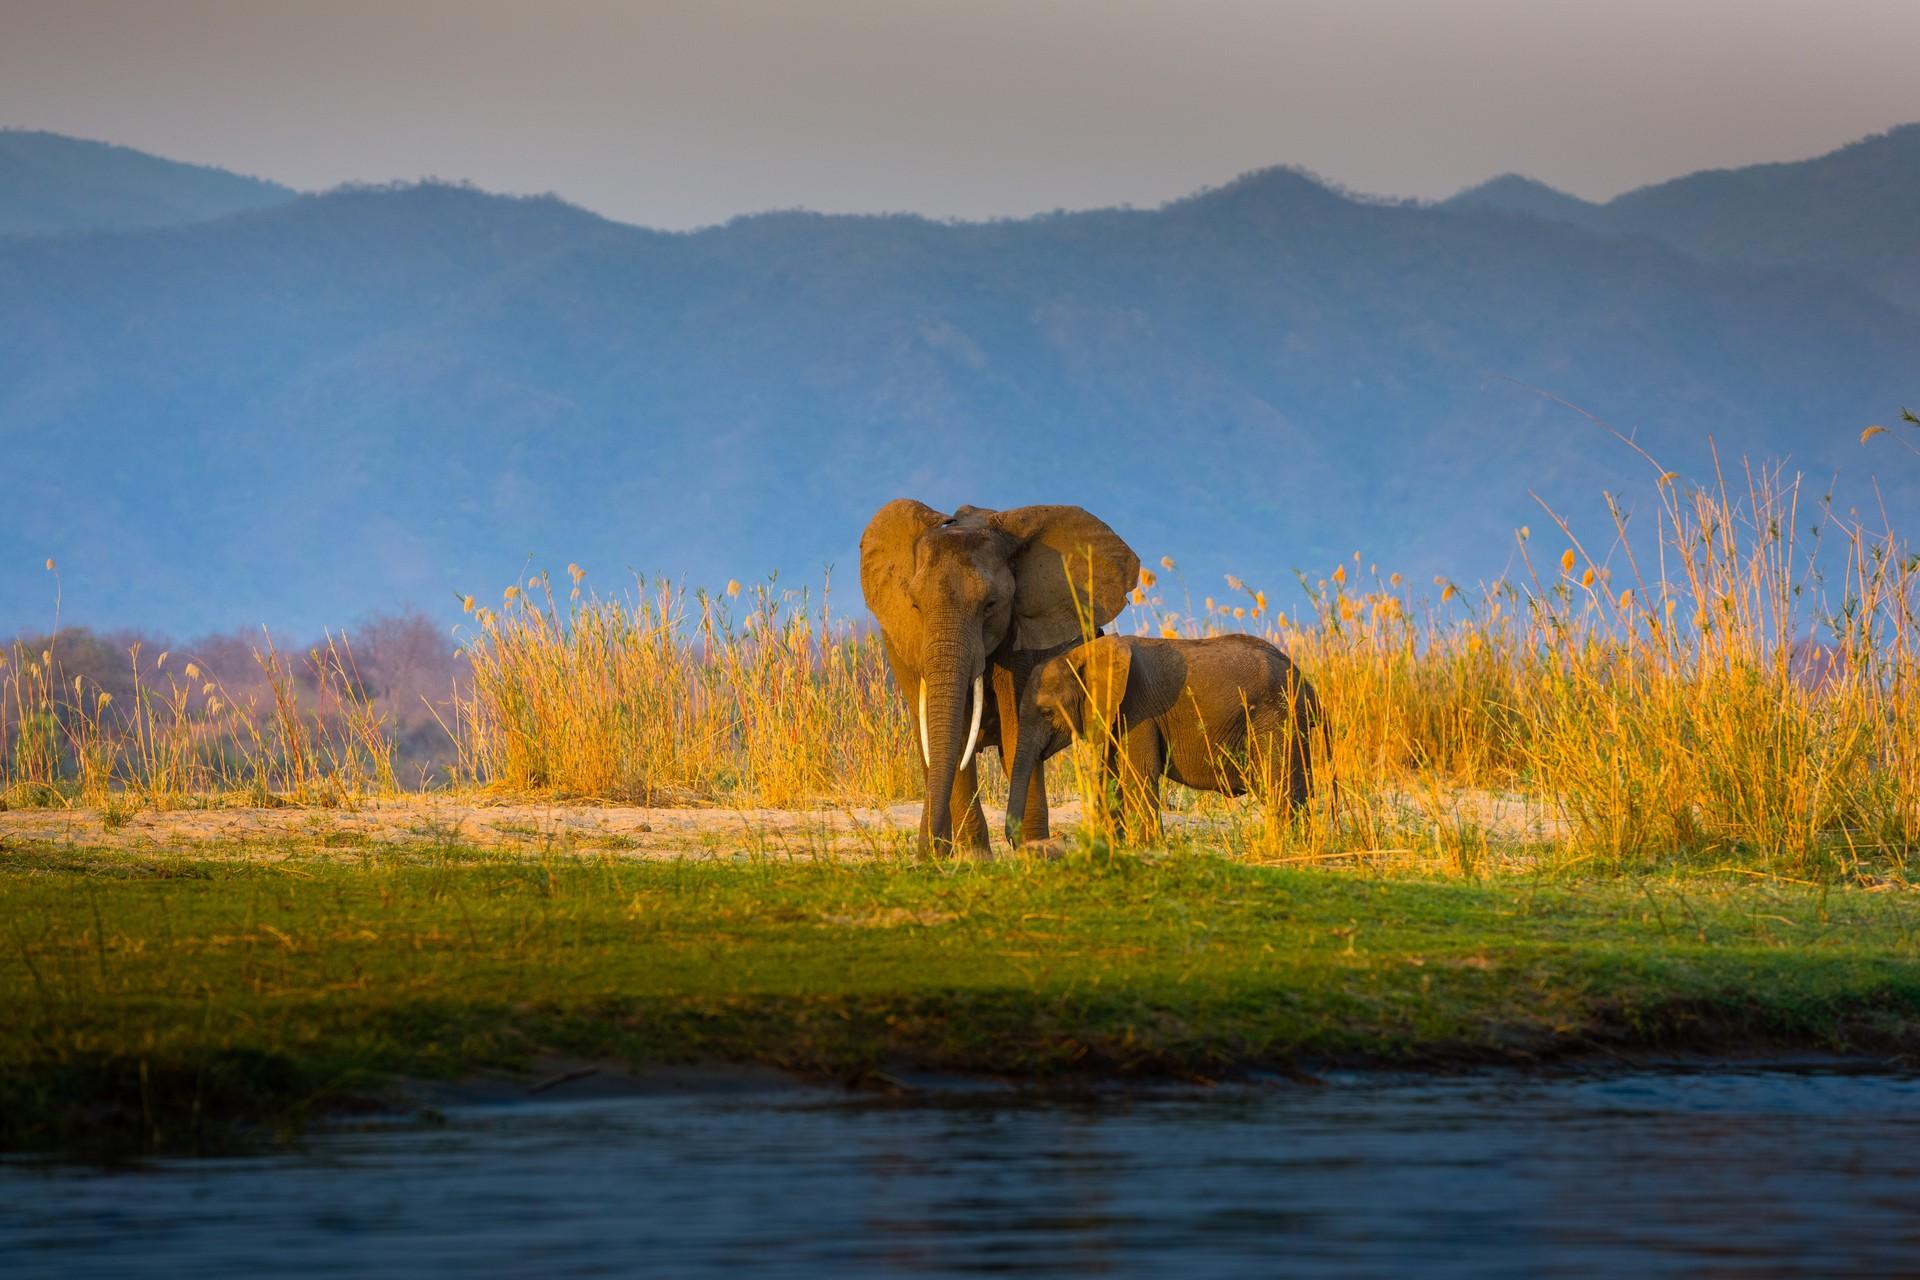 Best things to do in Zambia: Lower Zambezi National Park, Elephants